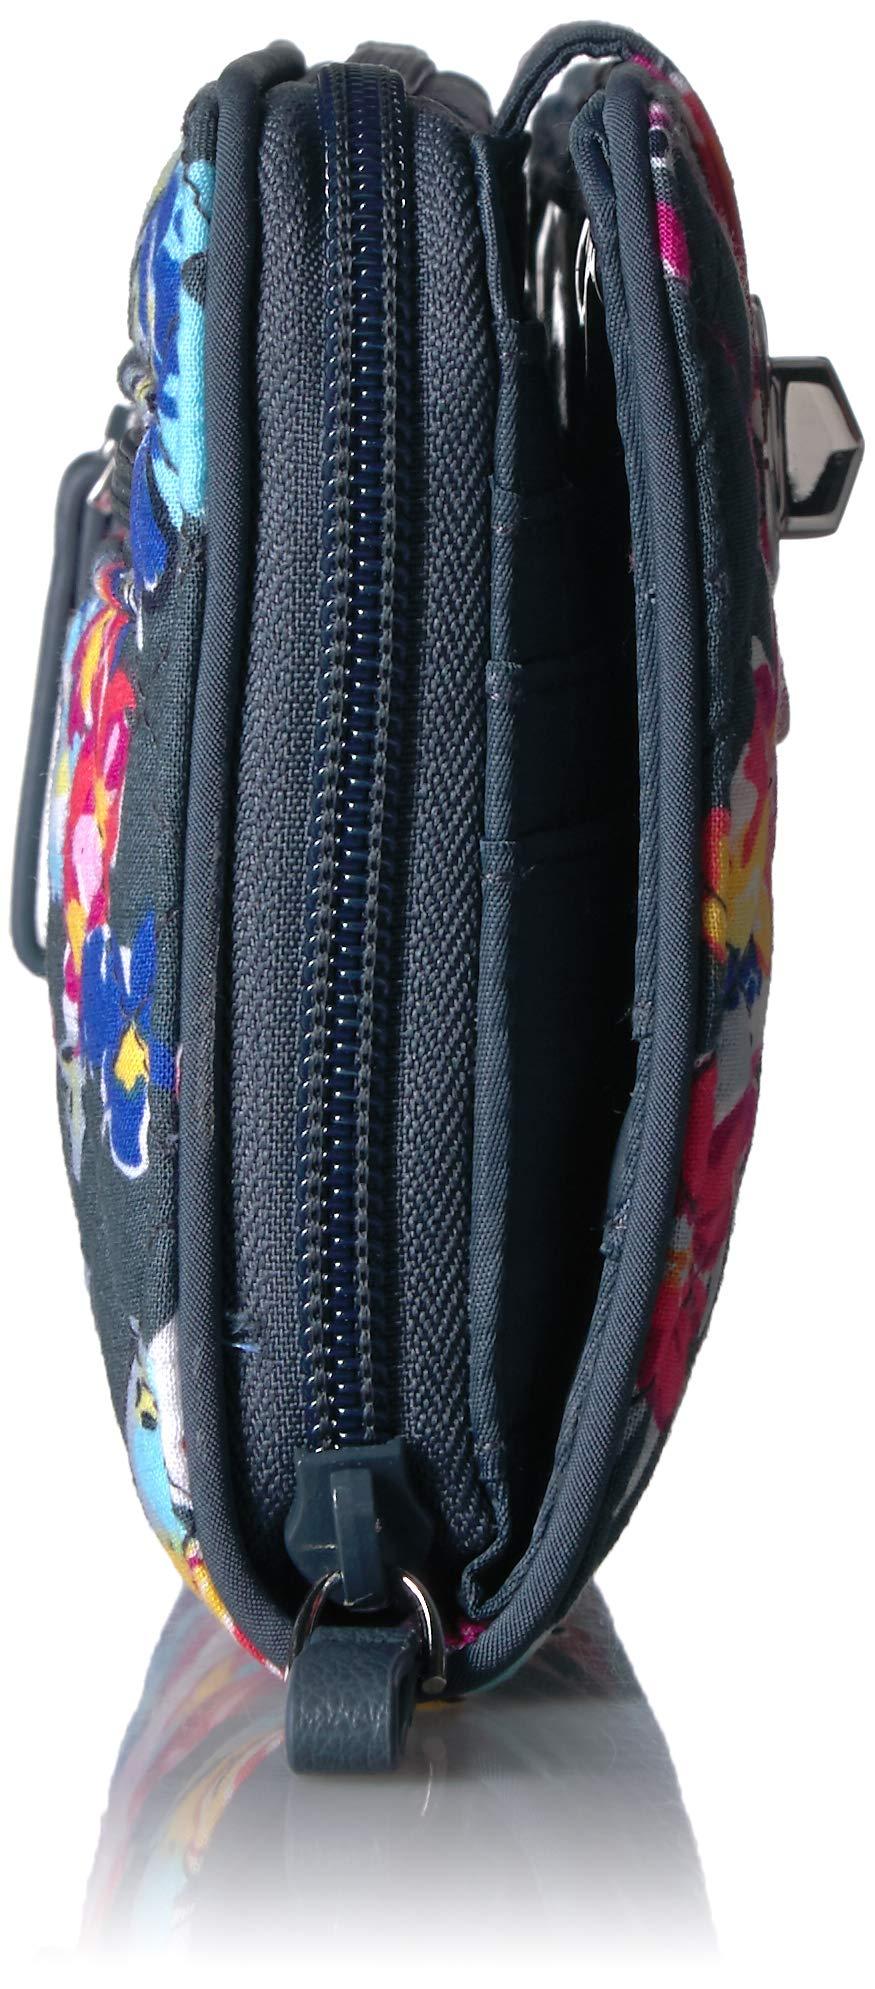 Vera Bradley Iconic RFID Turnlock Wallet, Signature Cotton, pretty Posies by Vera Bradley (Image #3)